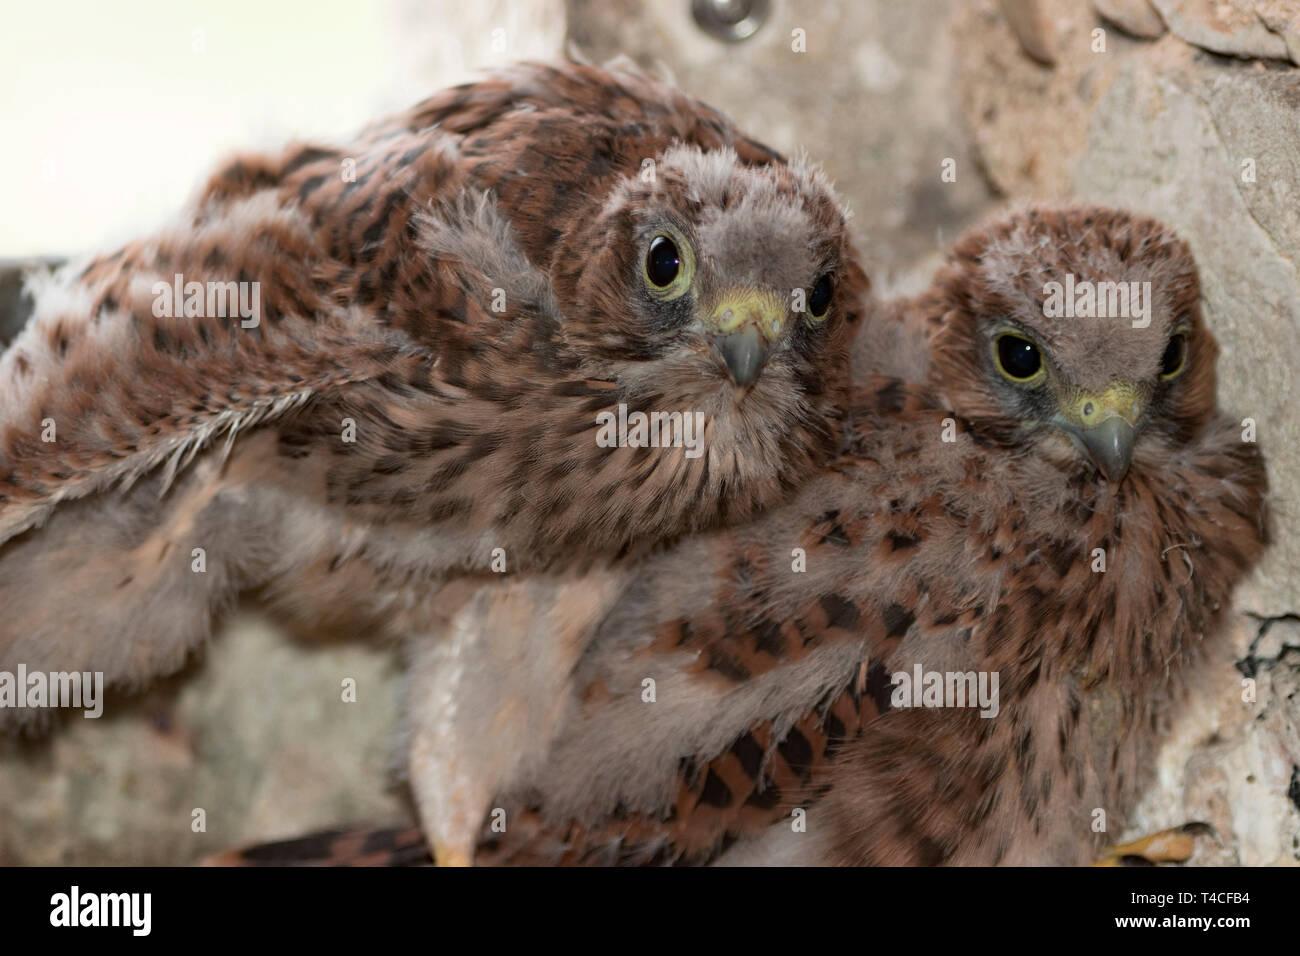 common kestrel, juveniles, (Falco tinnunculus) - Stock Image